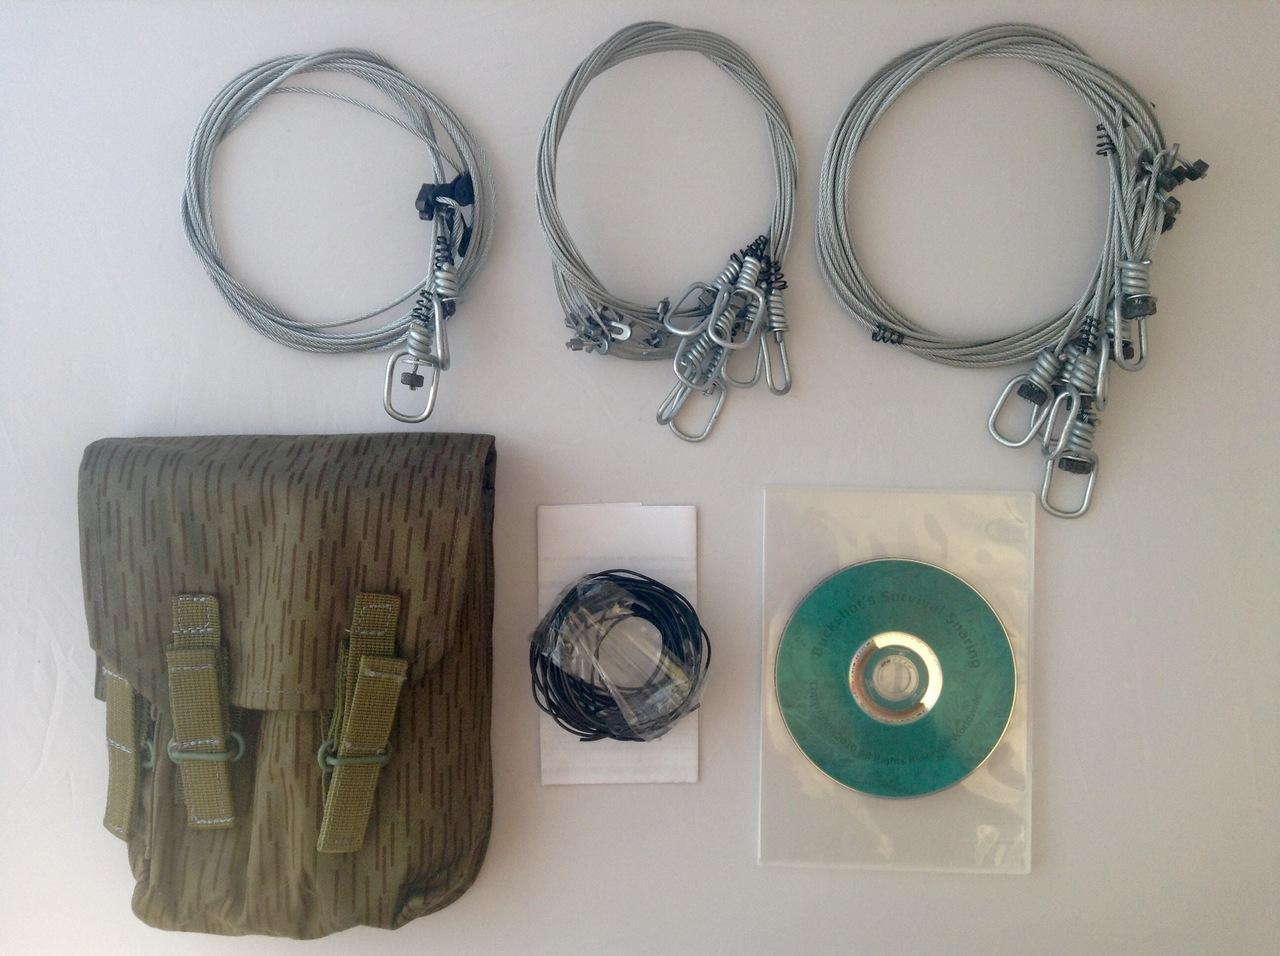 Buckshot's Emergency Snare Kit & Survival Snaring DVD